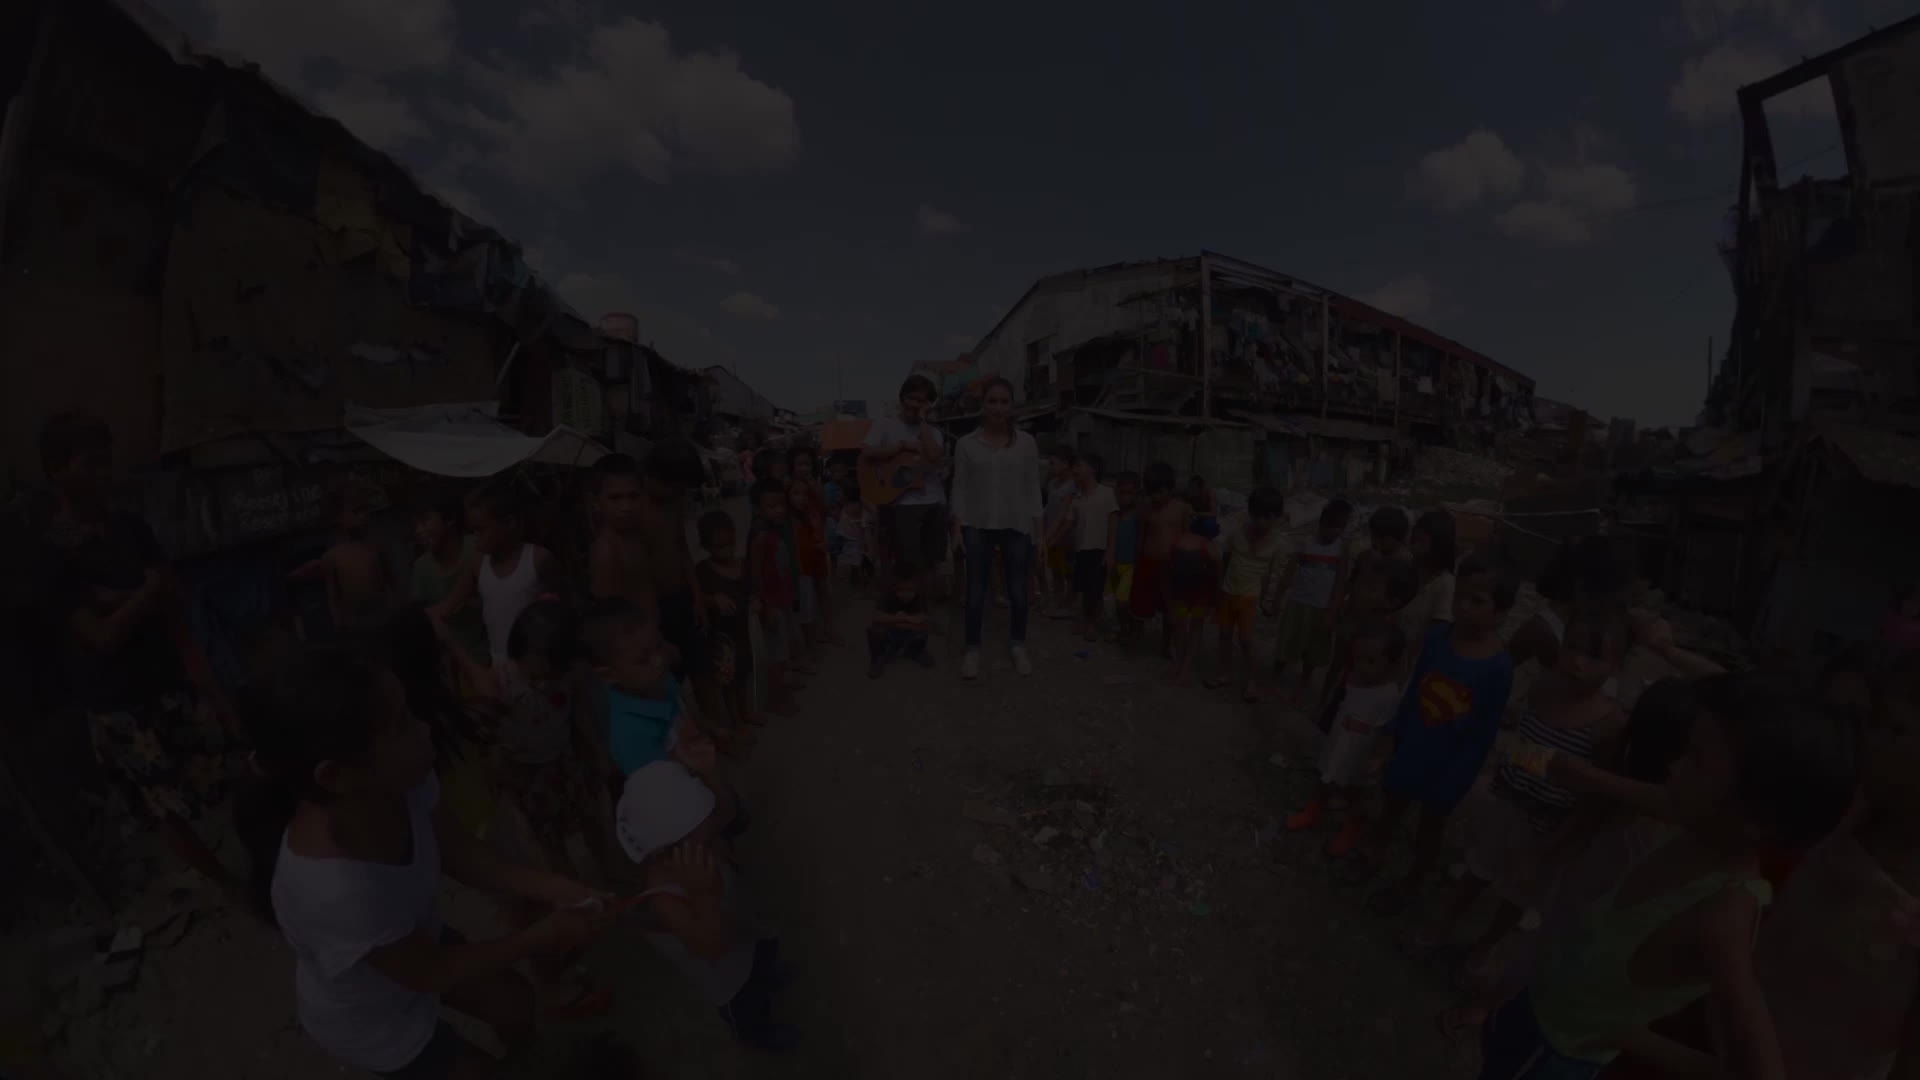 360video, virtualreality, vr, Happyland360 (watch at Chameleon VR app) GIFs